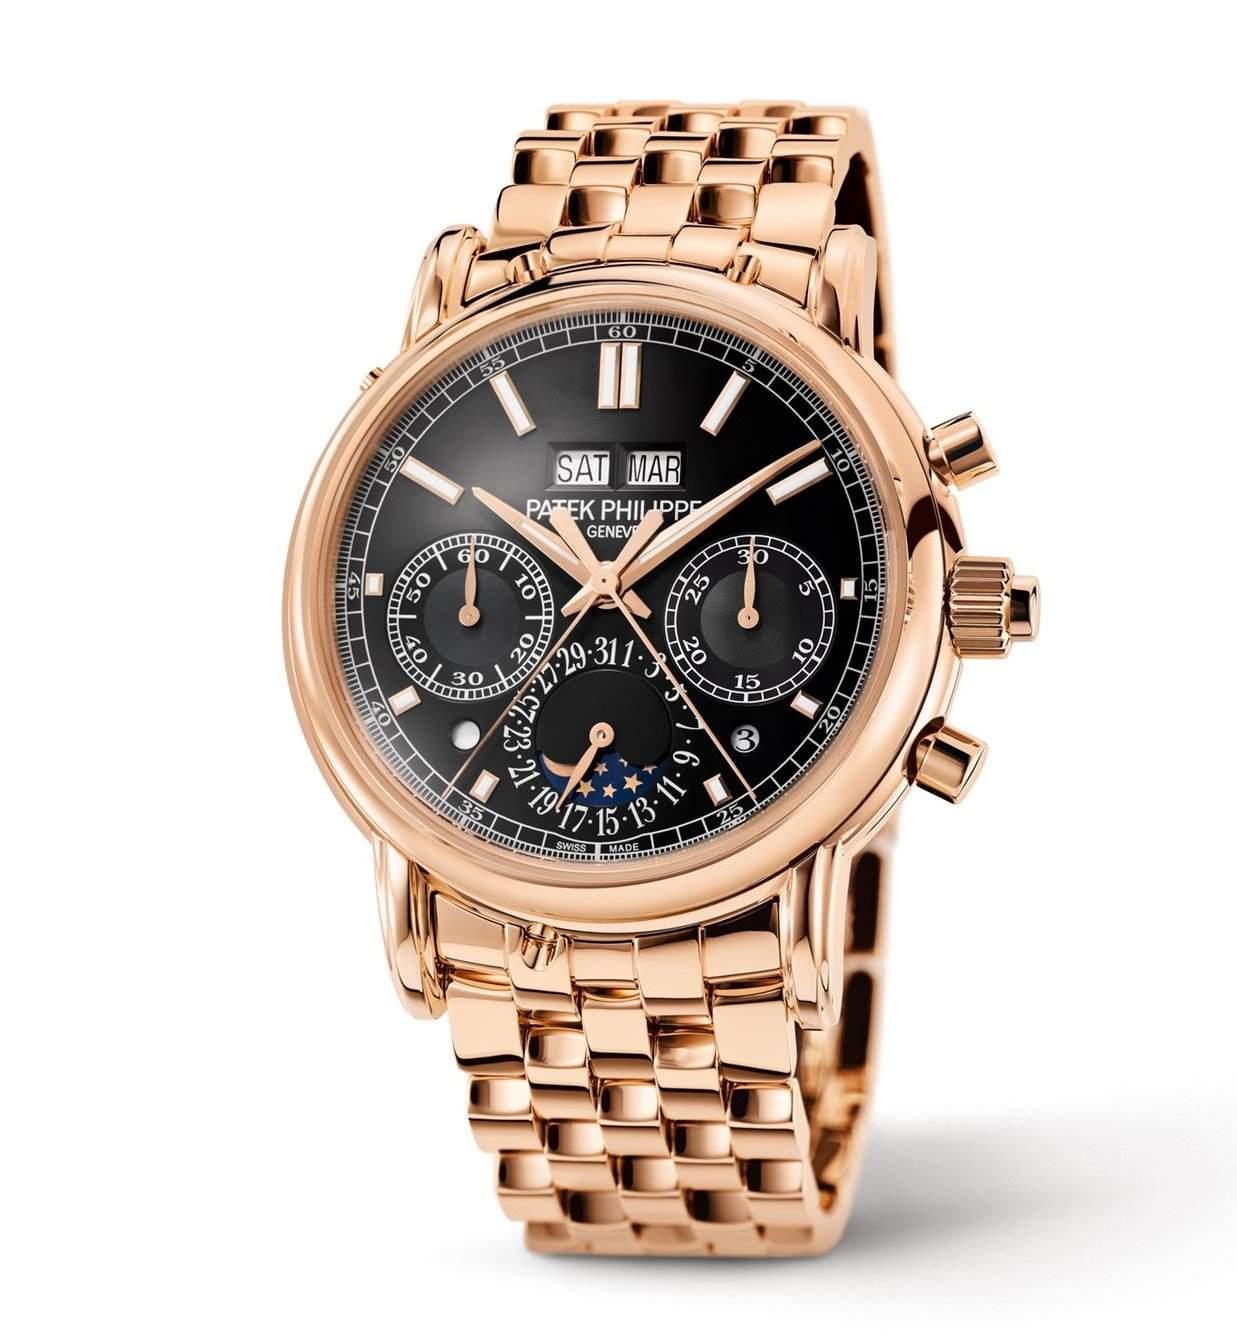 Patek Philippe Perpetual Calendar Chronograph 5204/1R-001